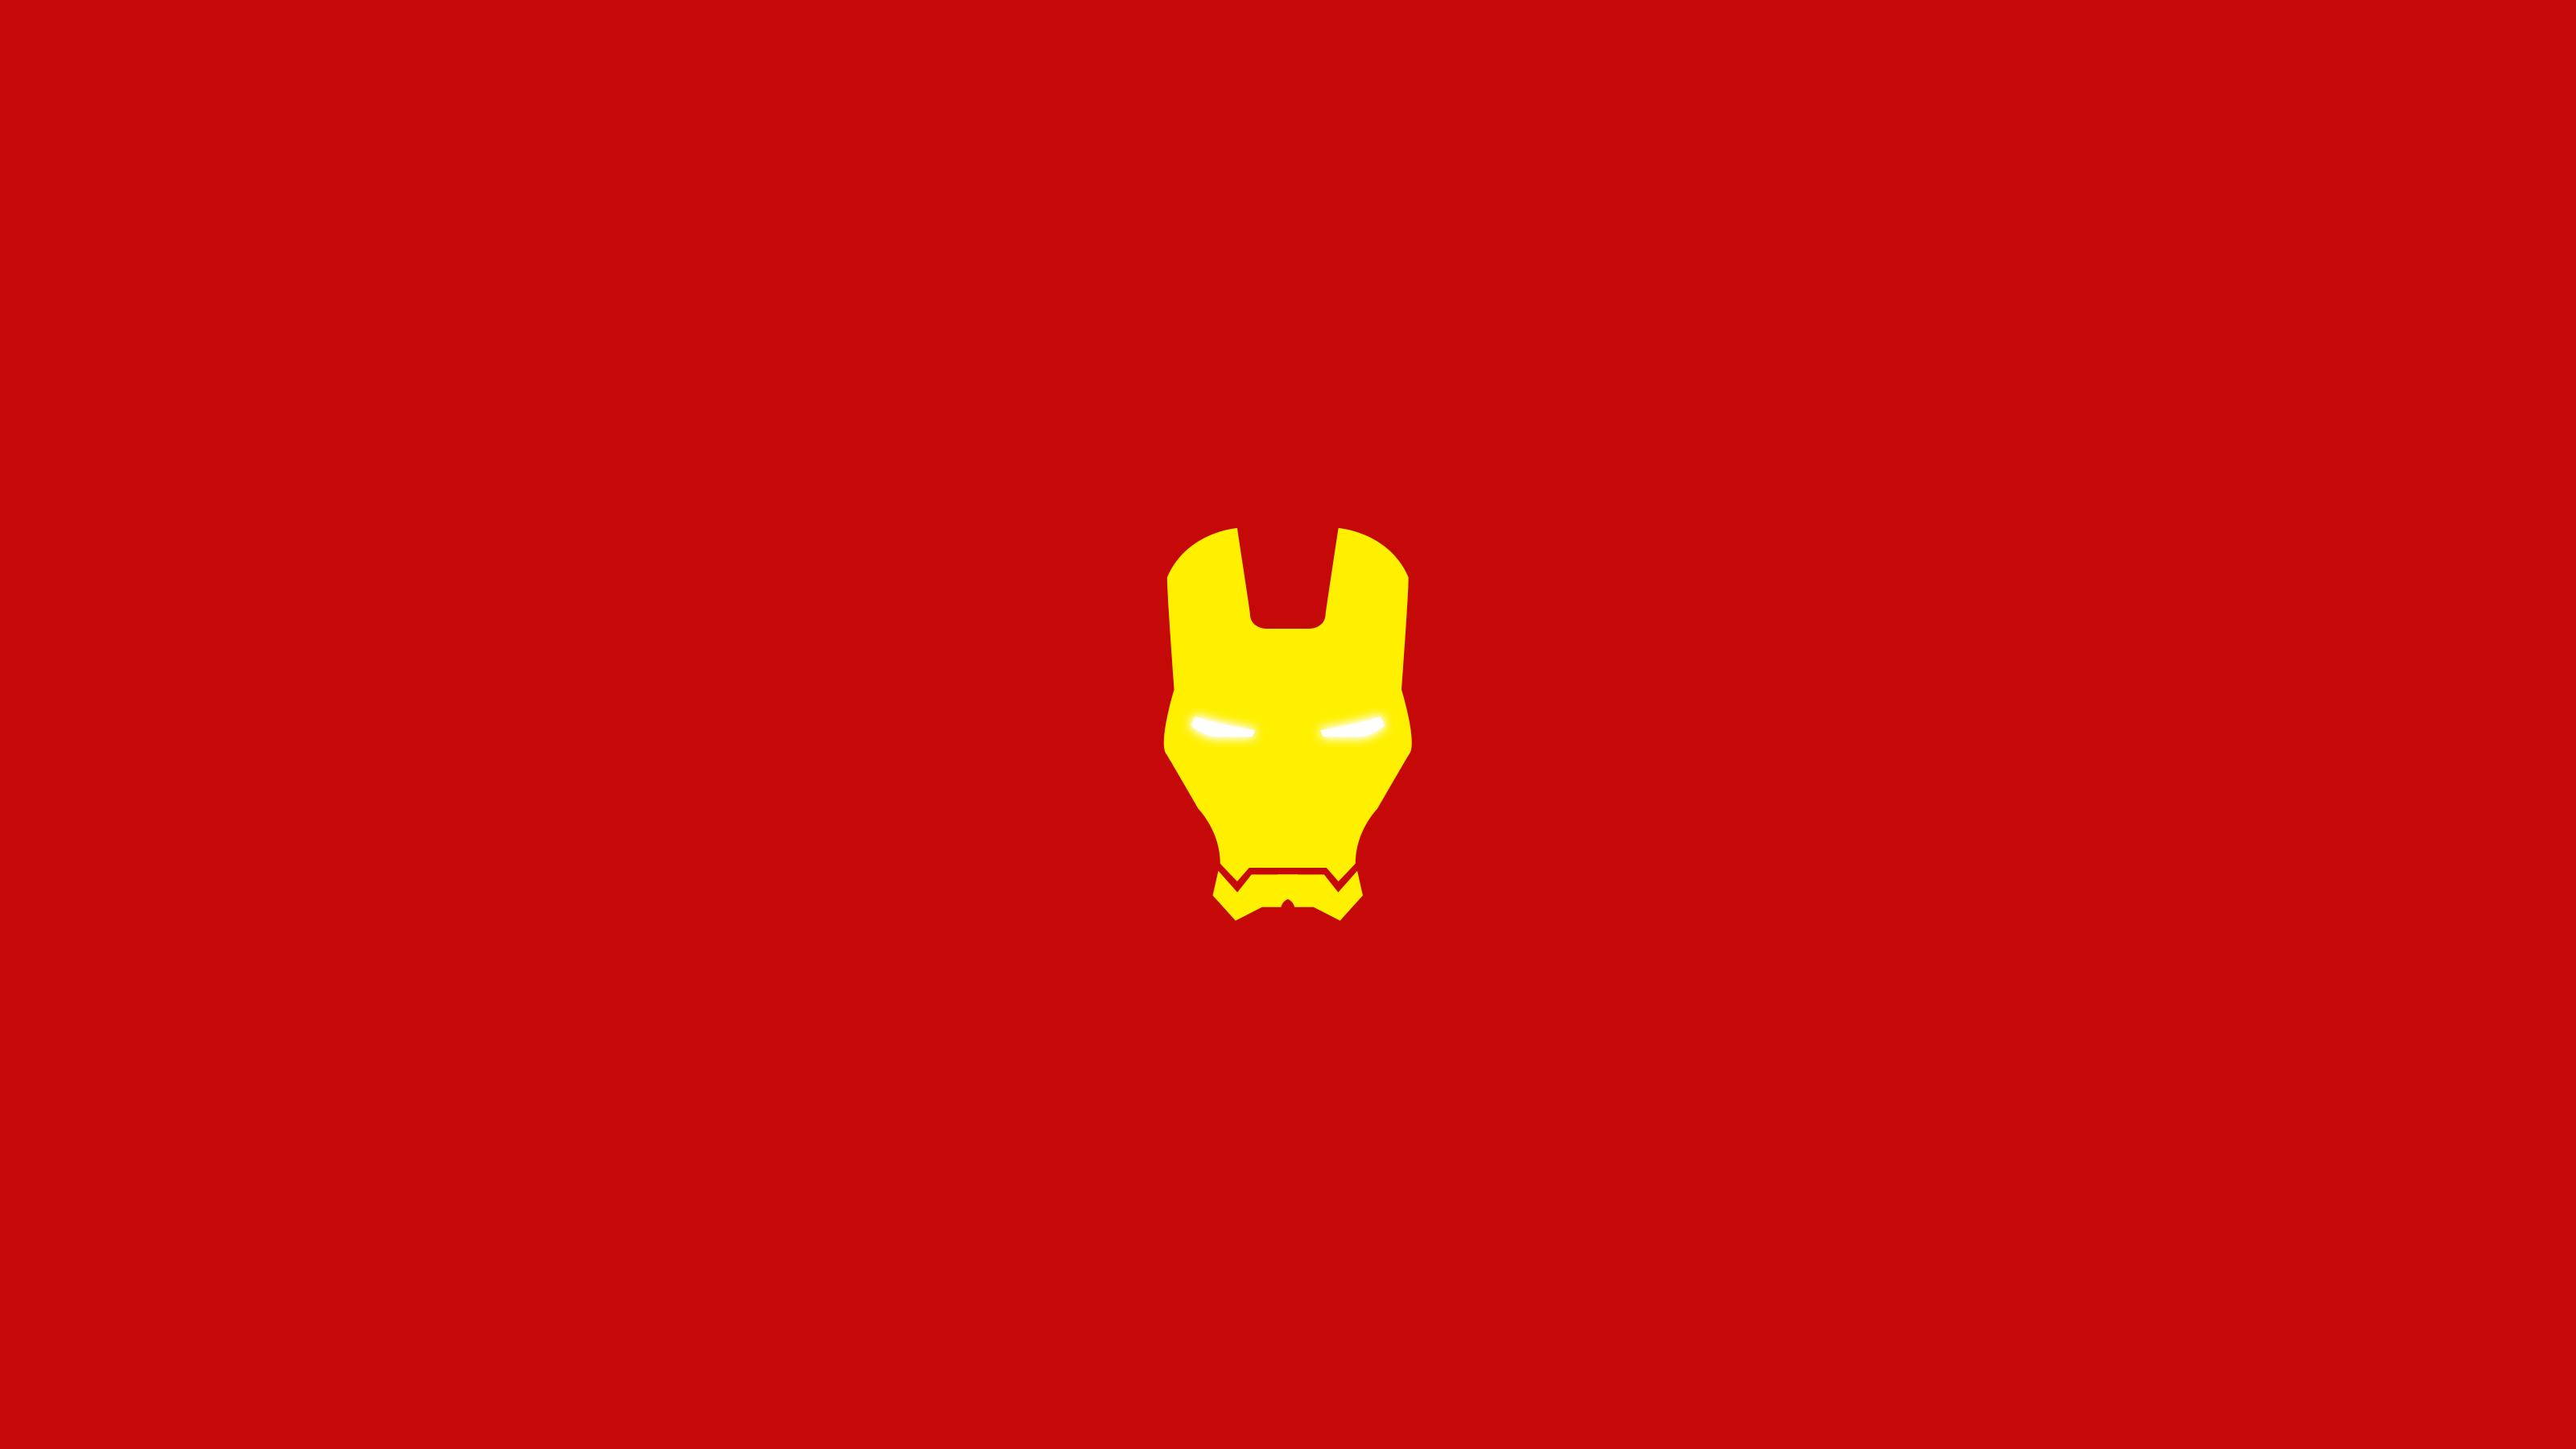 Group Of Iron Man Flat Wallpaper